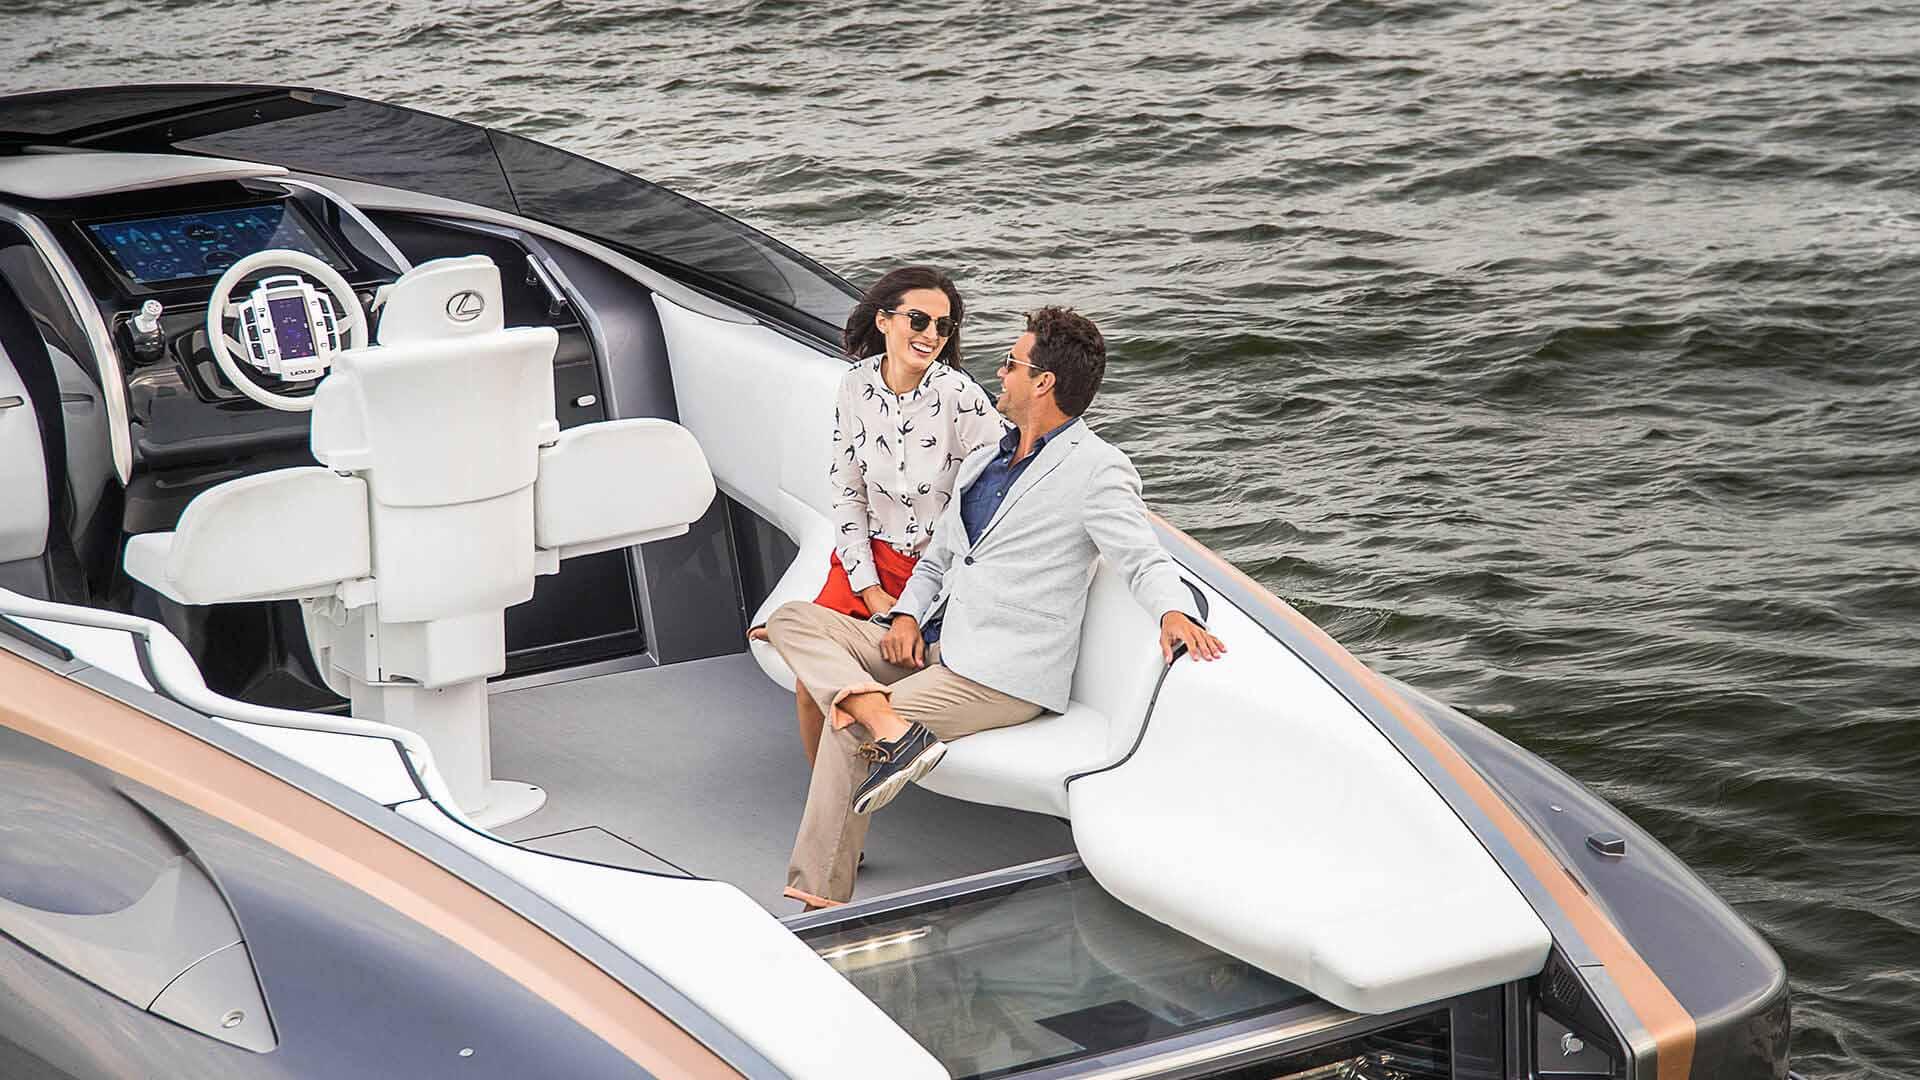 2017 lexus yacht gallery05